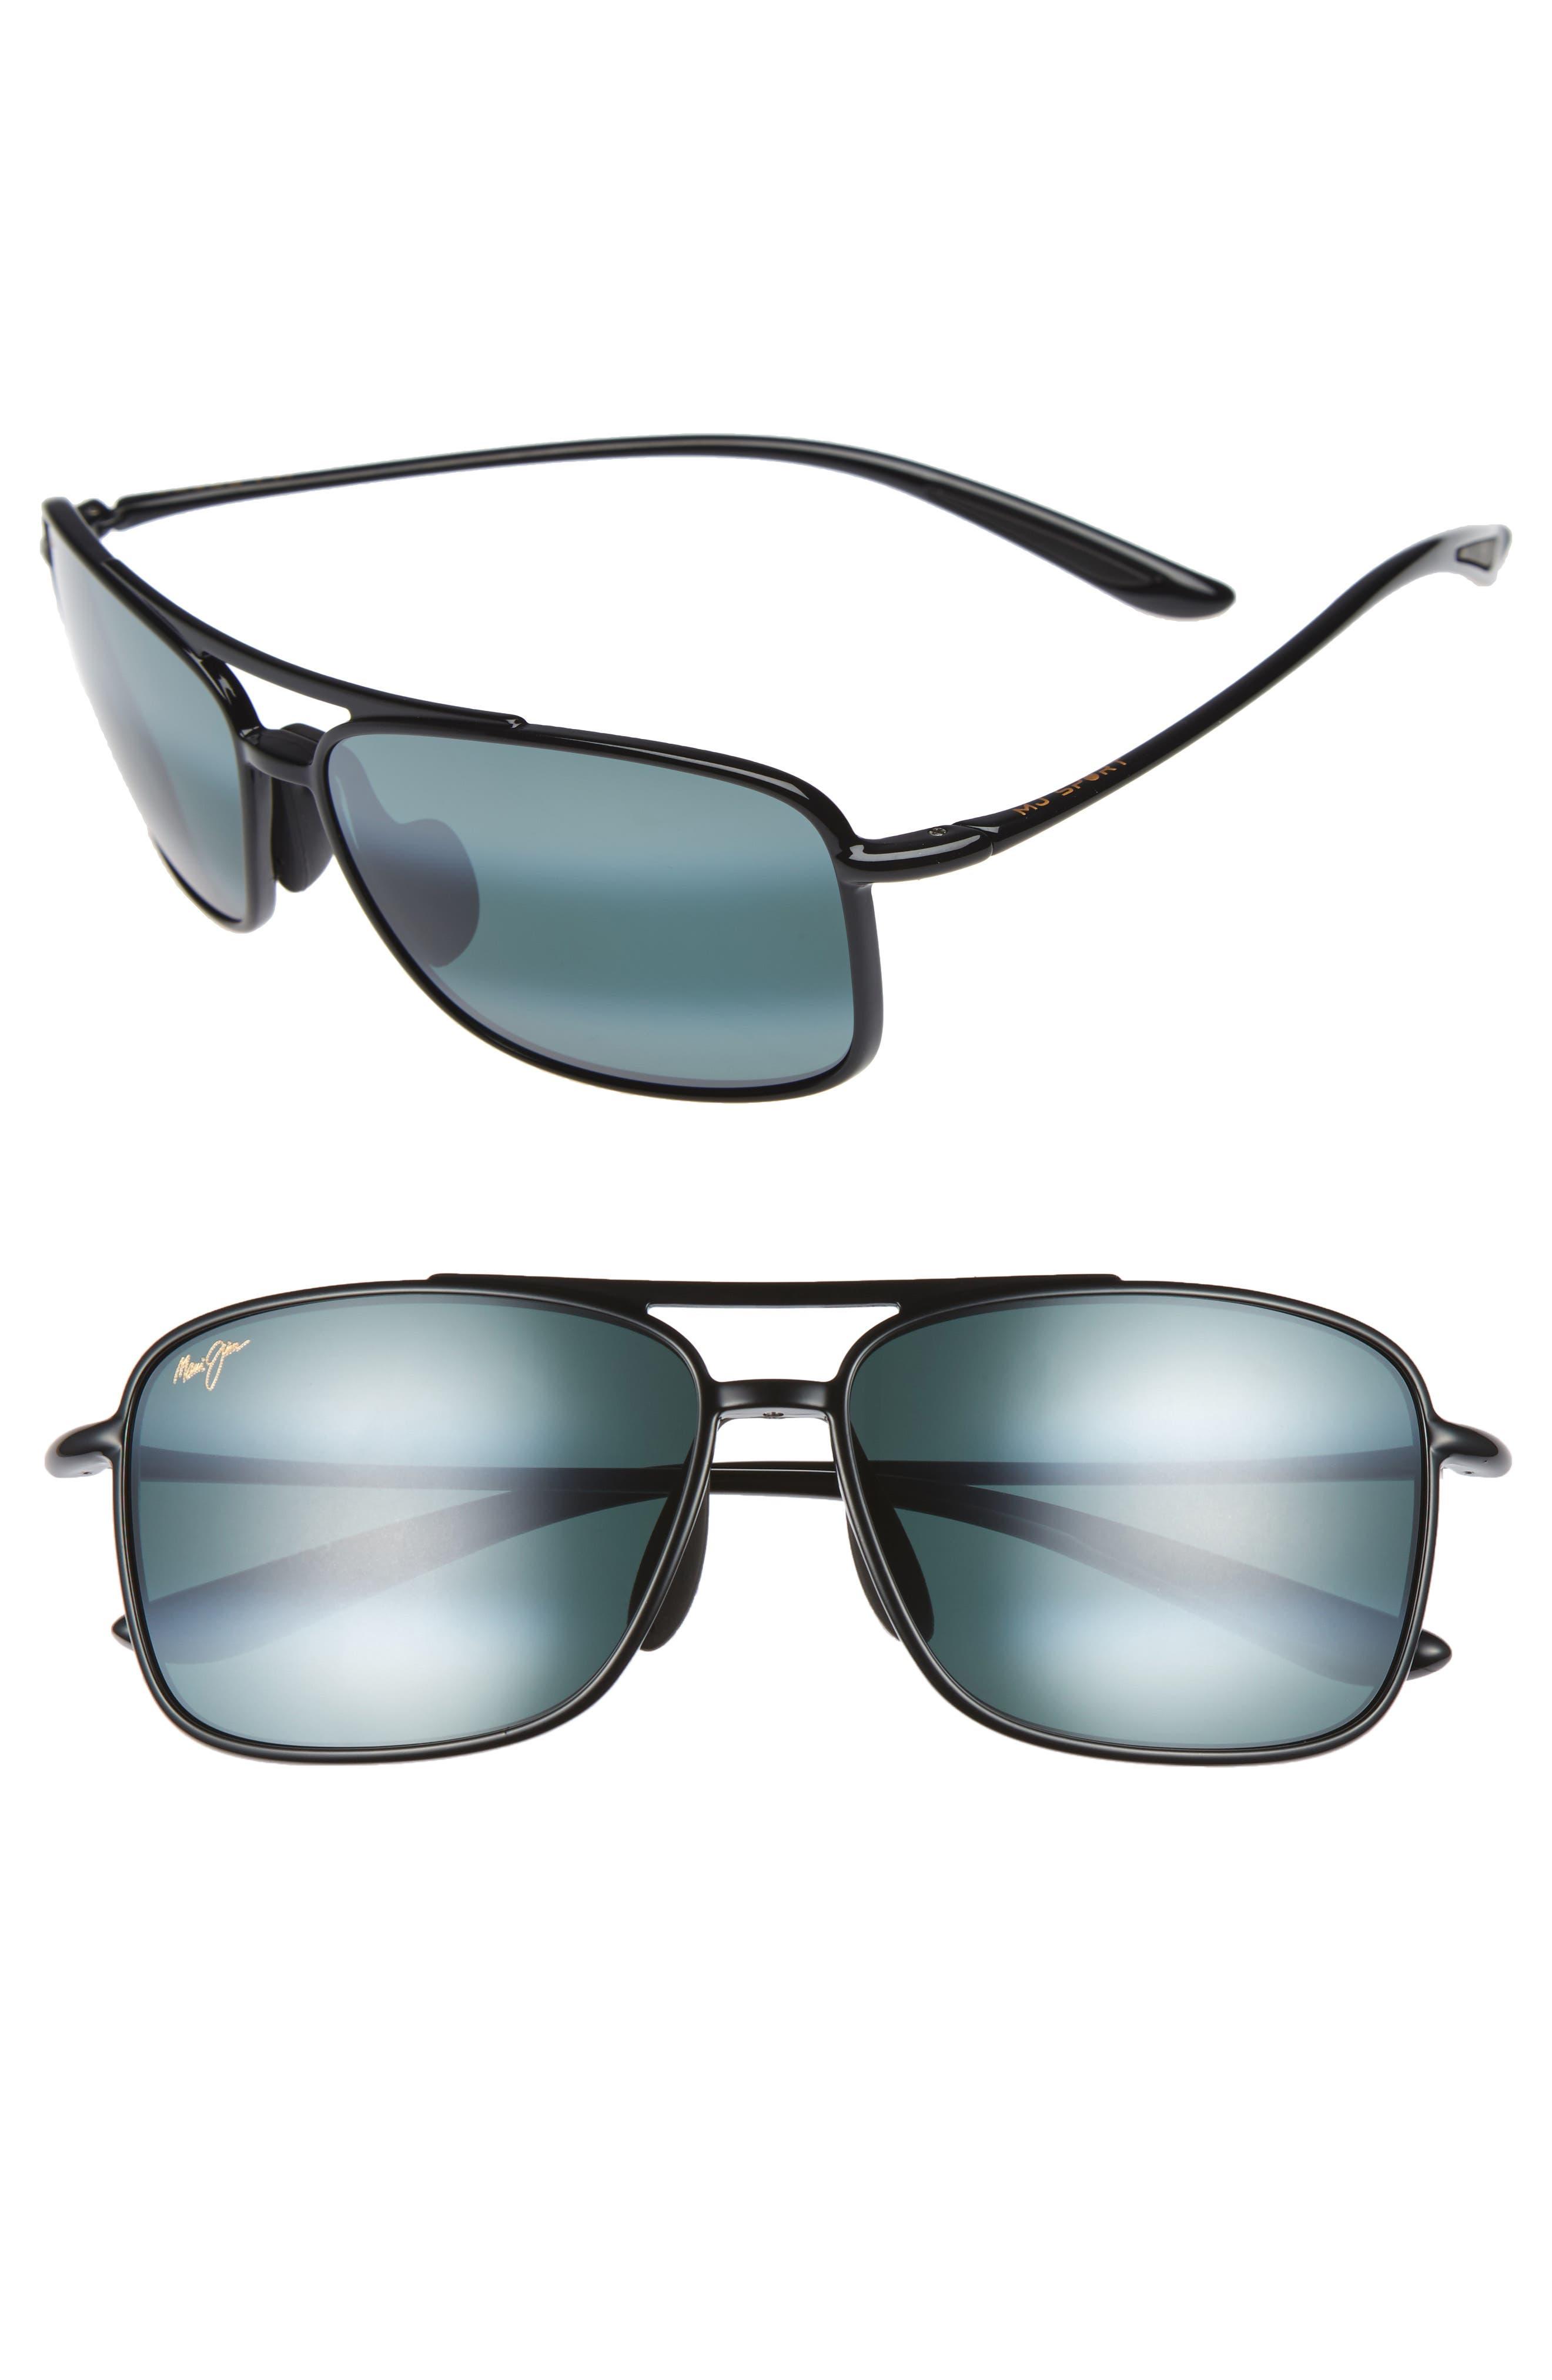 MAUI JIM, Kaupo Gap 61mm PolarizedPlus2<sup>®</sup> Sunglasses, Main thumbnail 1, color, GLOSS BLACK/ NEUTRAL GREY